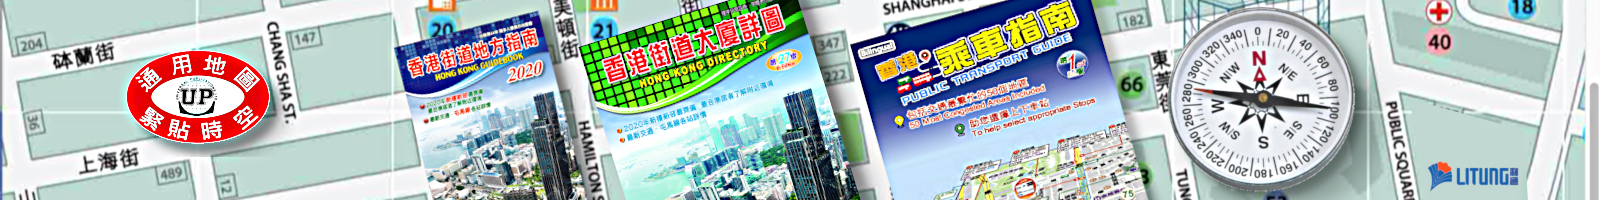 Banner 通用圖書 香港街道地方指南 大廈詳圖 LTLogo 1600x200